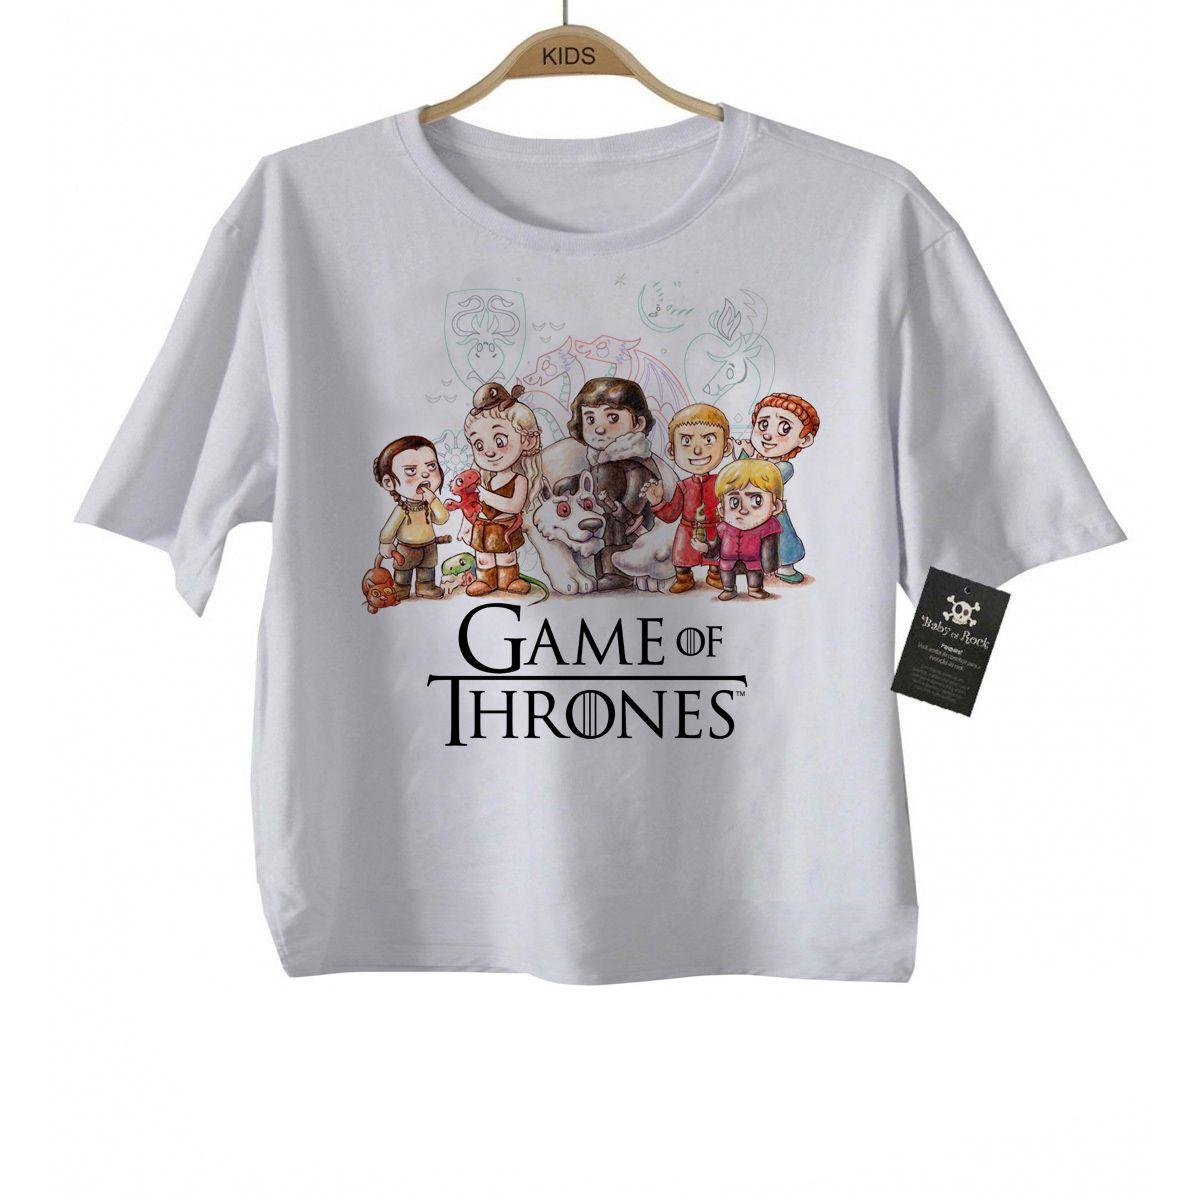 Camiseta Infantil- Filmes - Game of Thrones - Aquarela White  - Baby Monster S/A